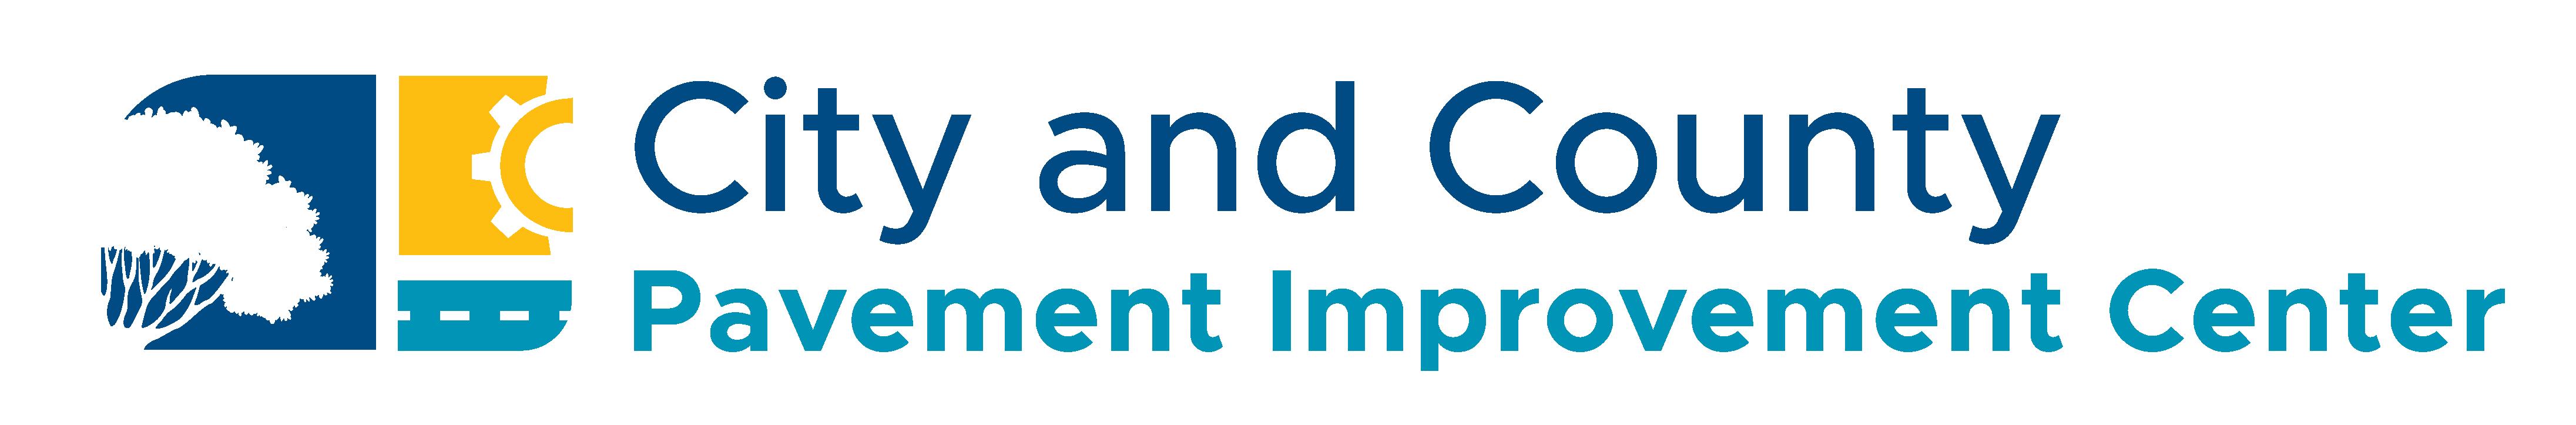 CCPIC logo